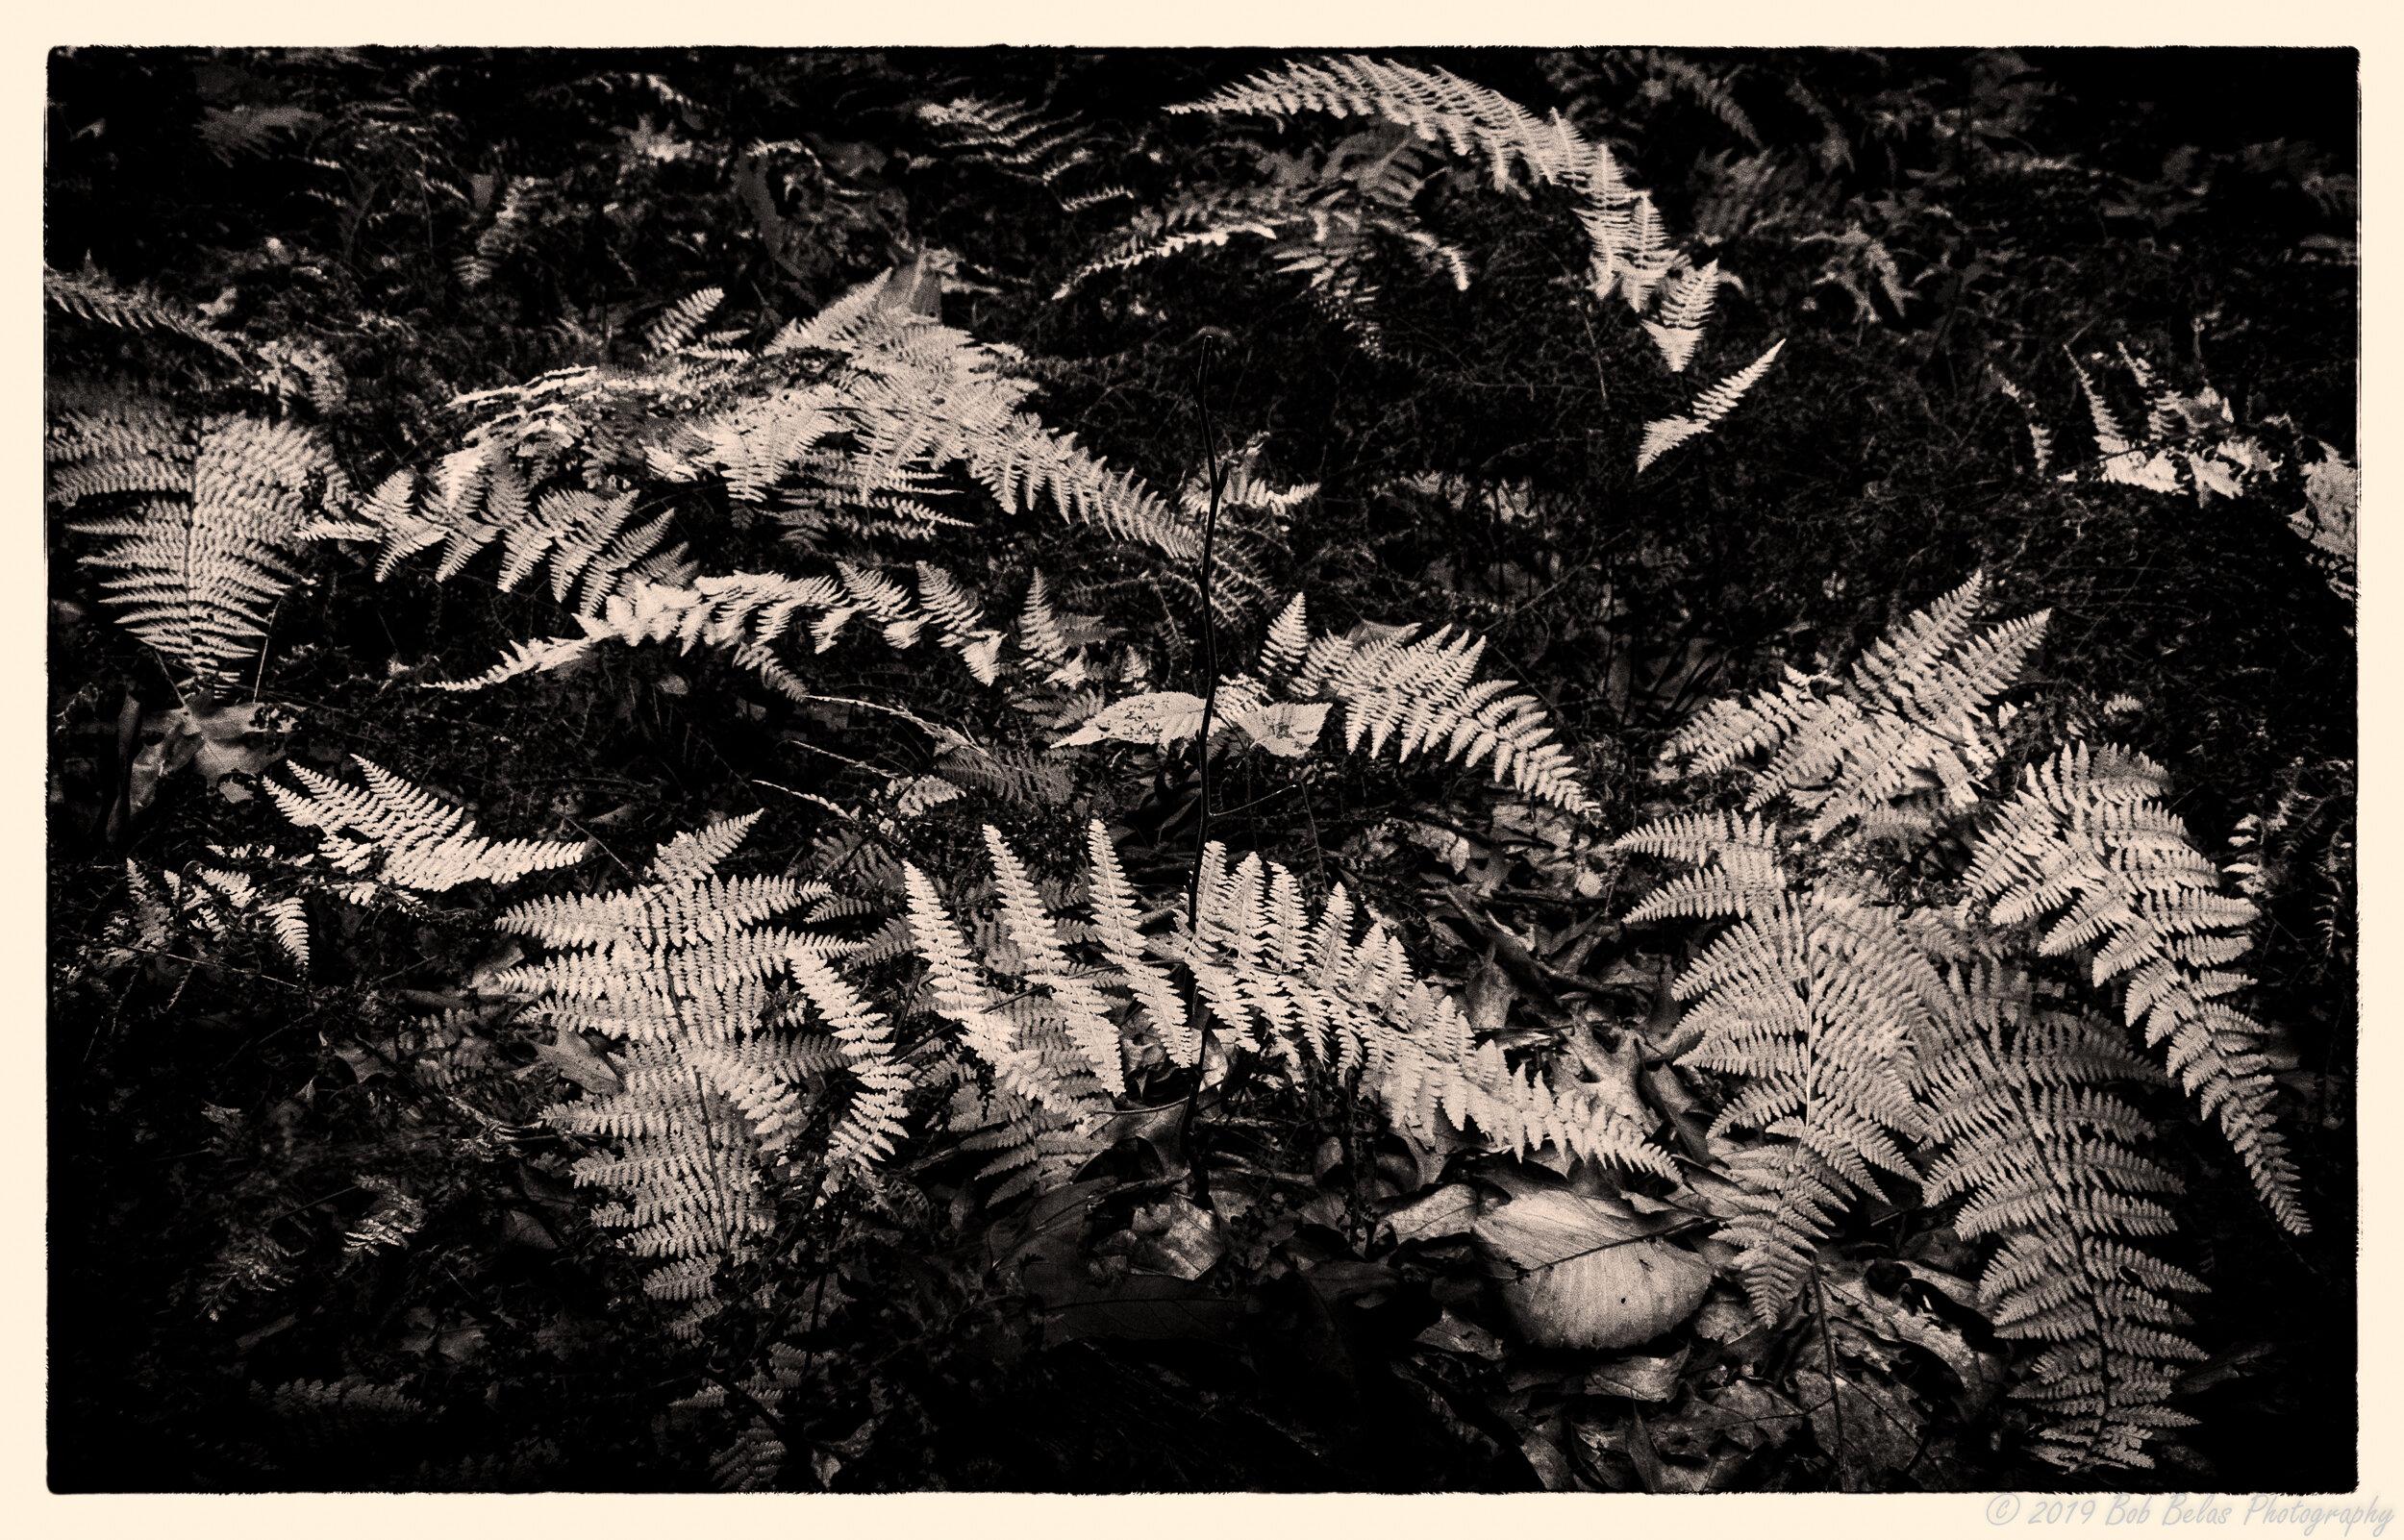 Ferns at dusk 1, monochrome